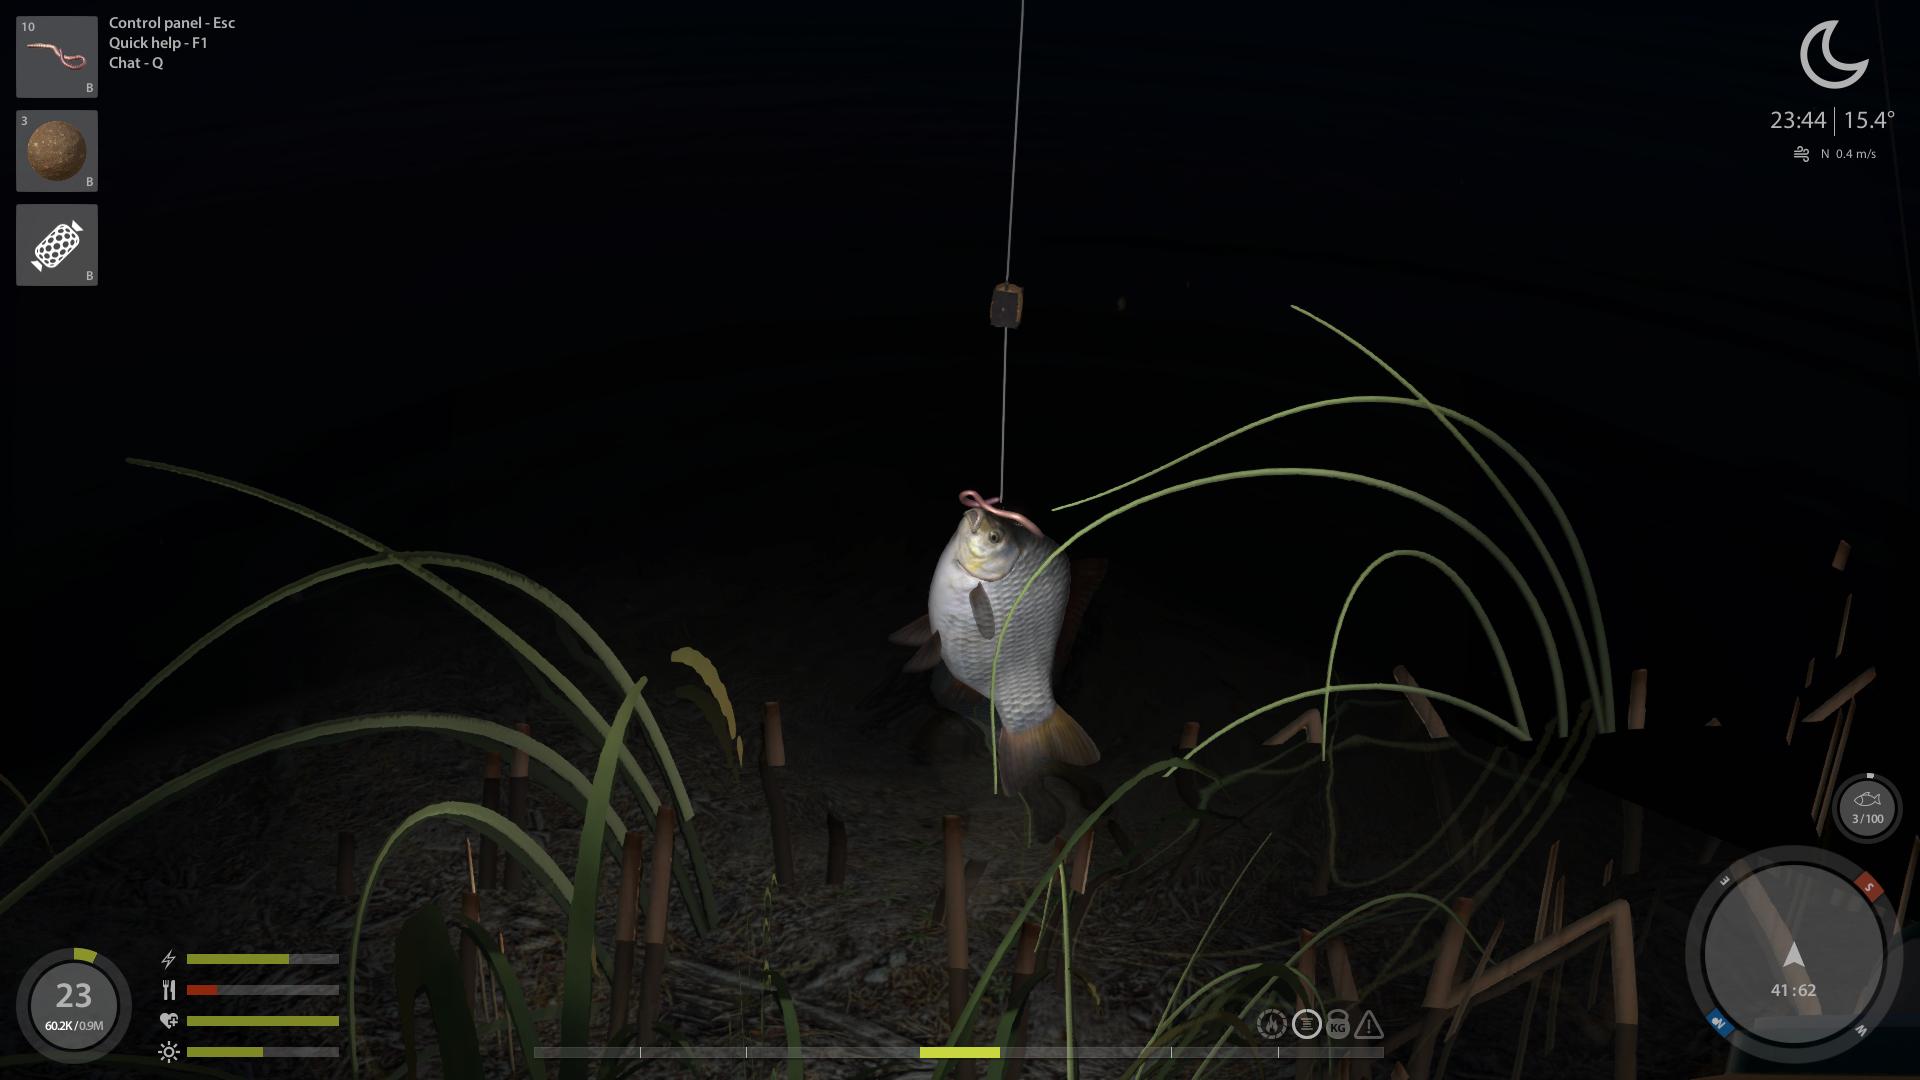 Russian Fishing 4 *Gratis* GibelT.png.b808d817f0447bfba25300271319a0b2